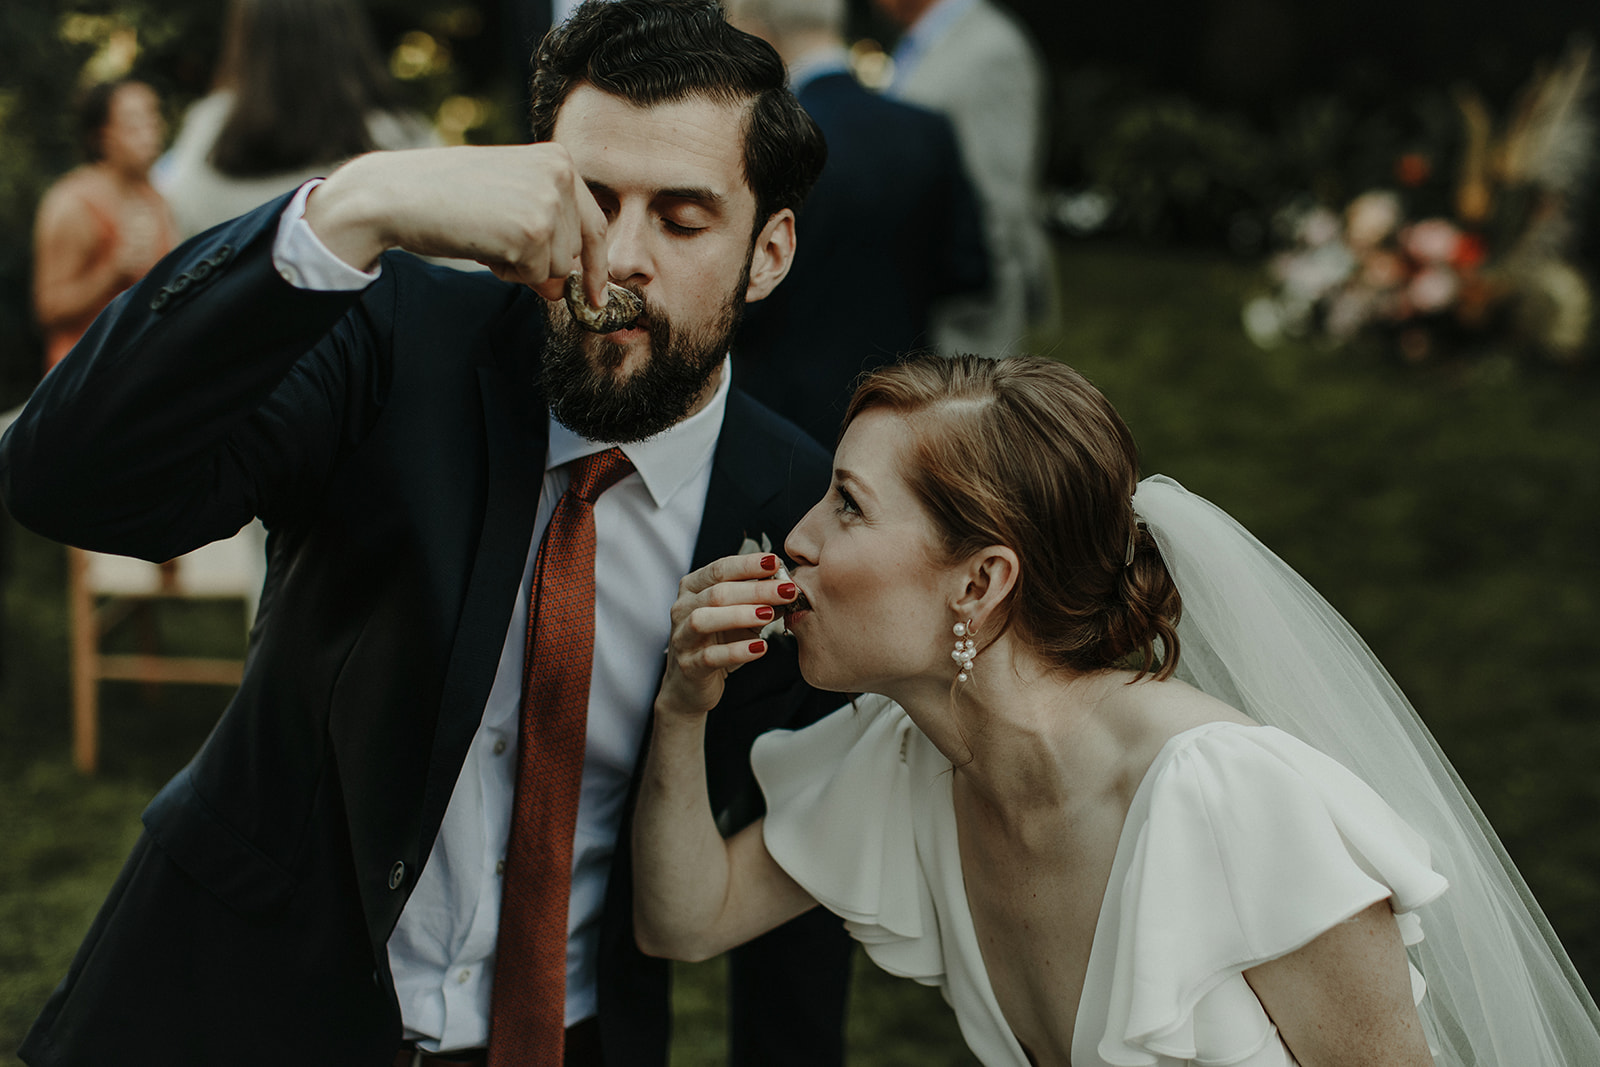 Ways to Make an Intimate Wedding Memorable